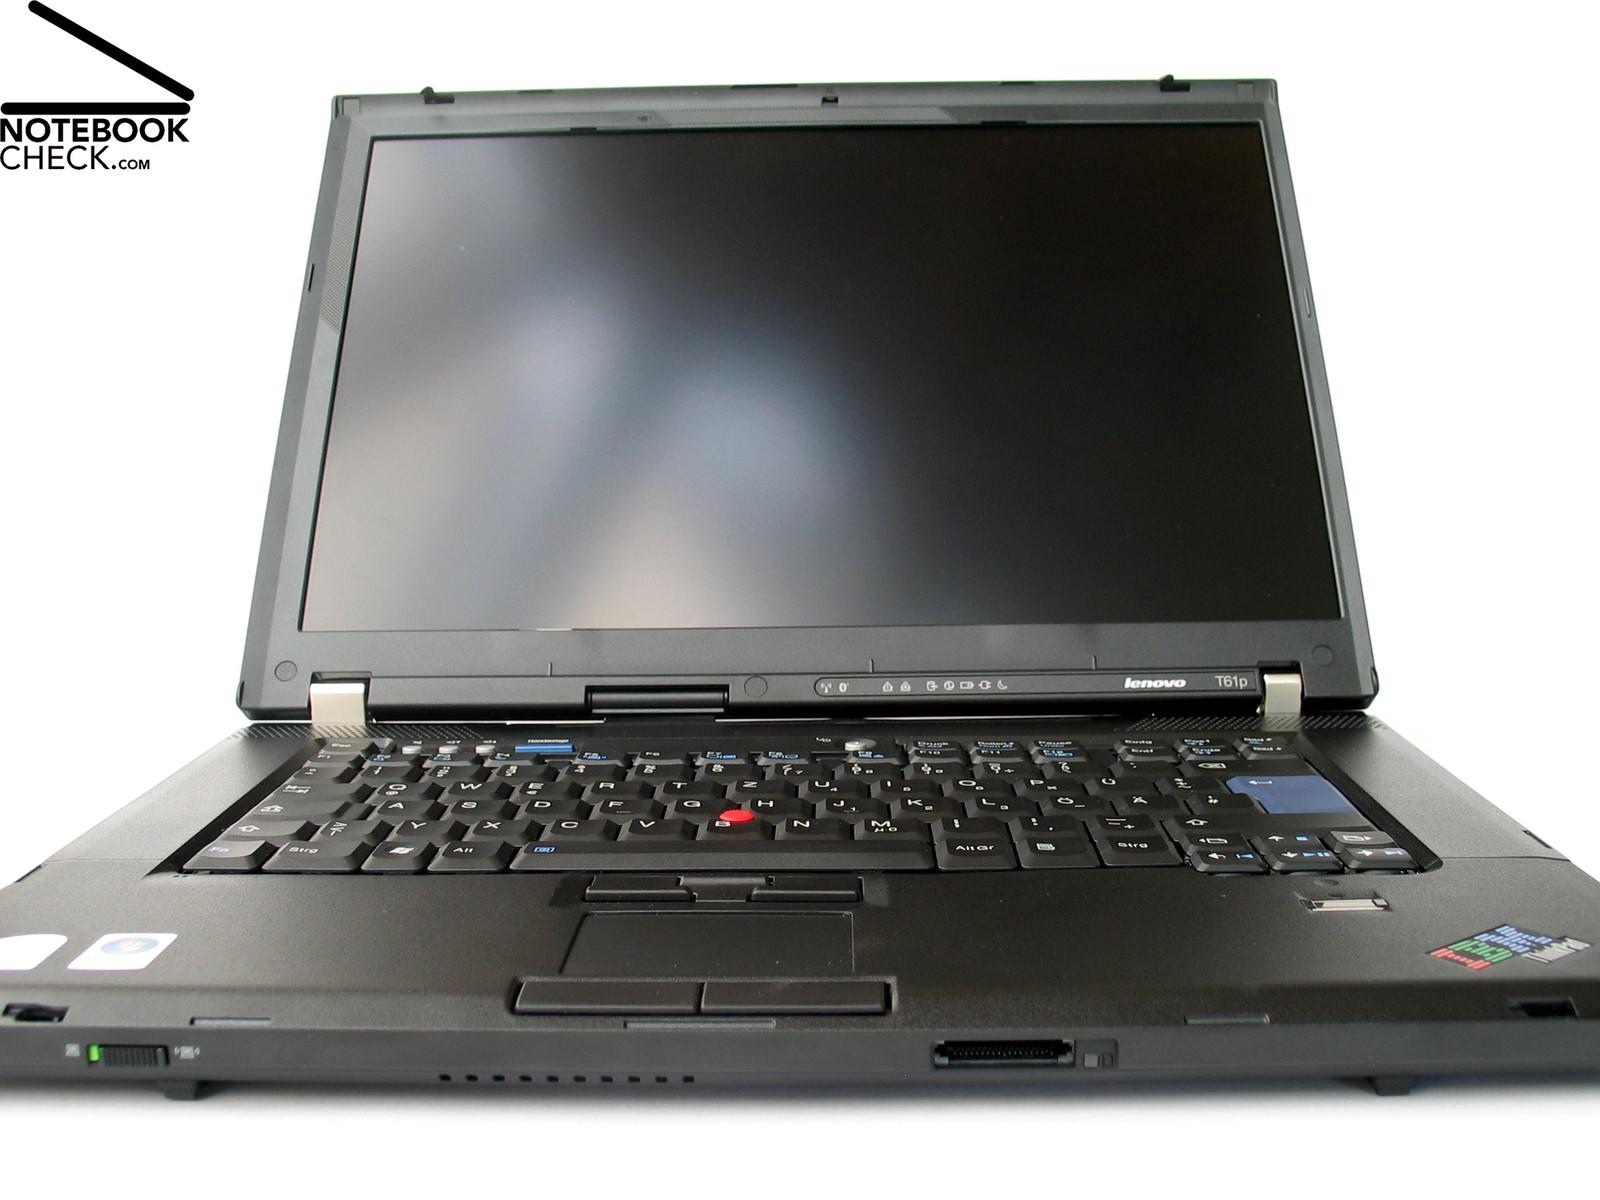 Lenovo ThinkPad T61p Monitor Drivers for Windows Mac